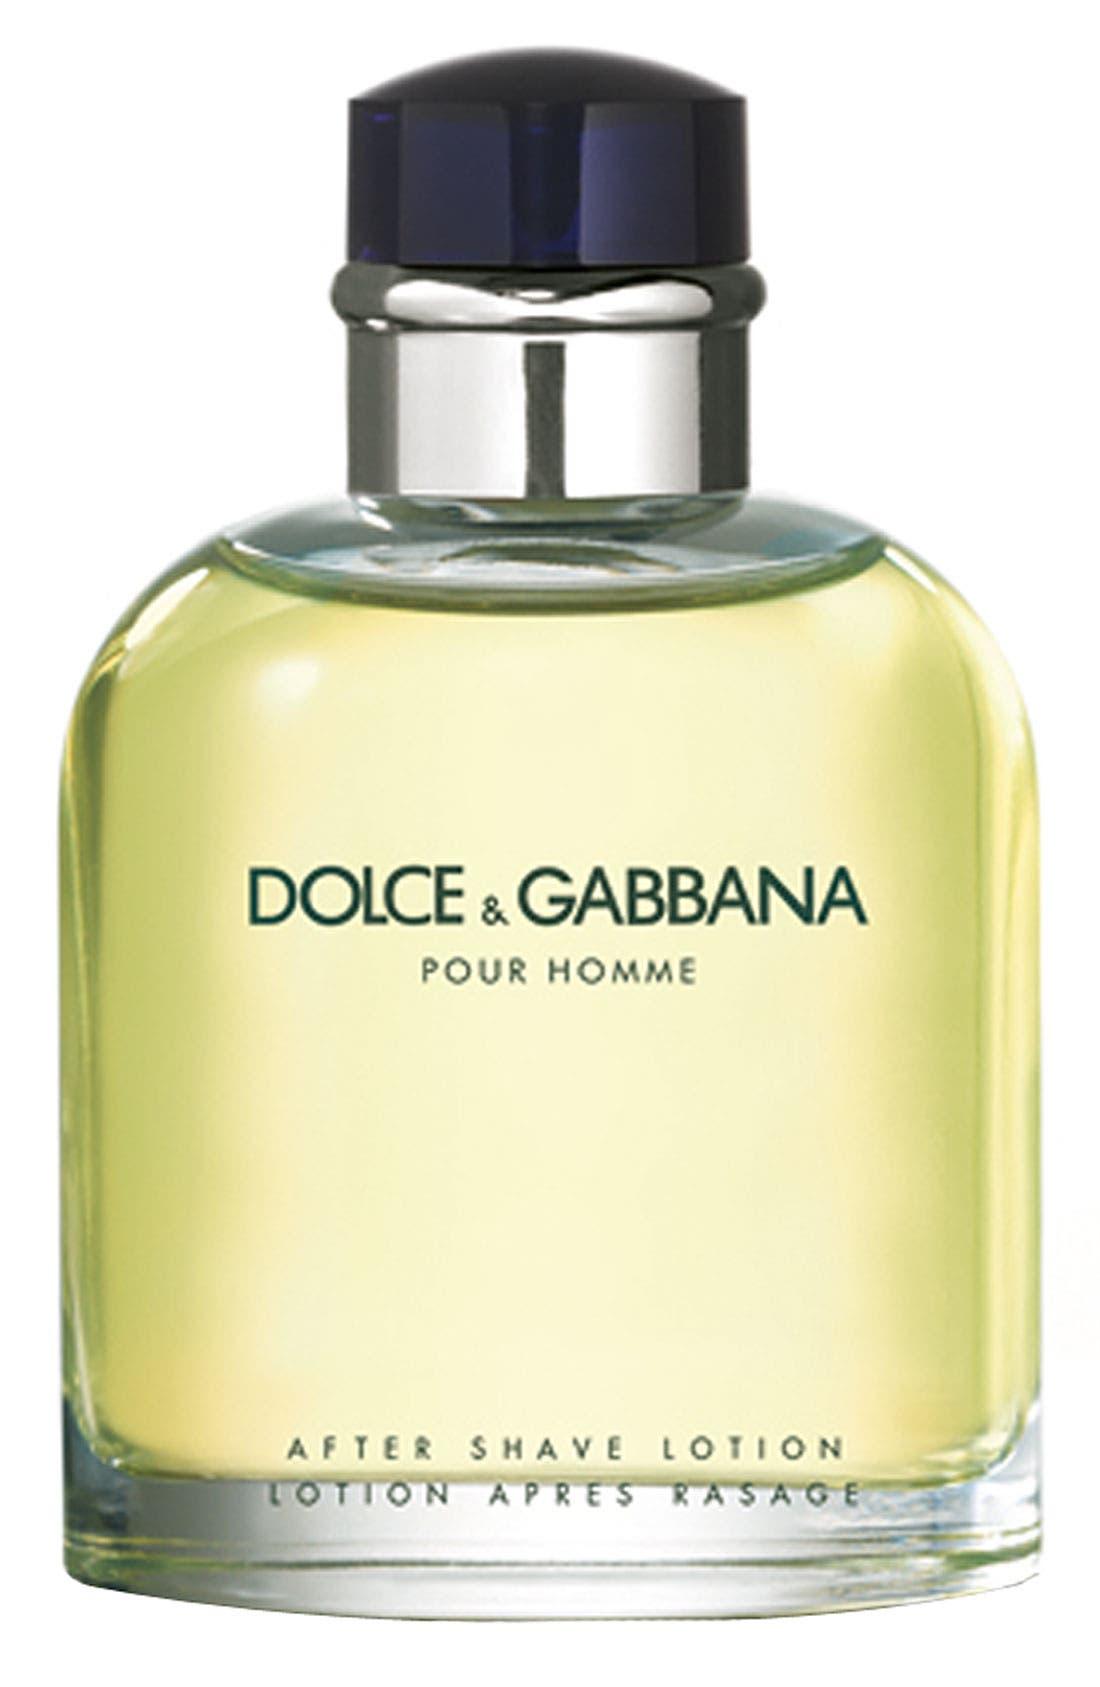 Dolce&Gabbana Beauty 'Pour Homme' After Shave Lotion Splash